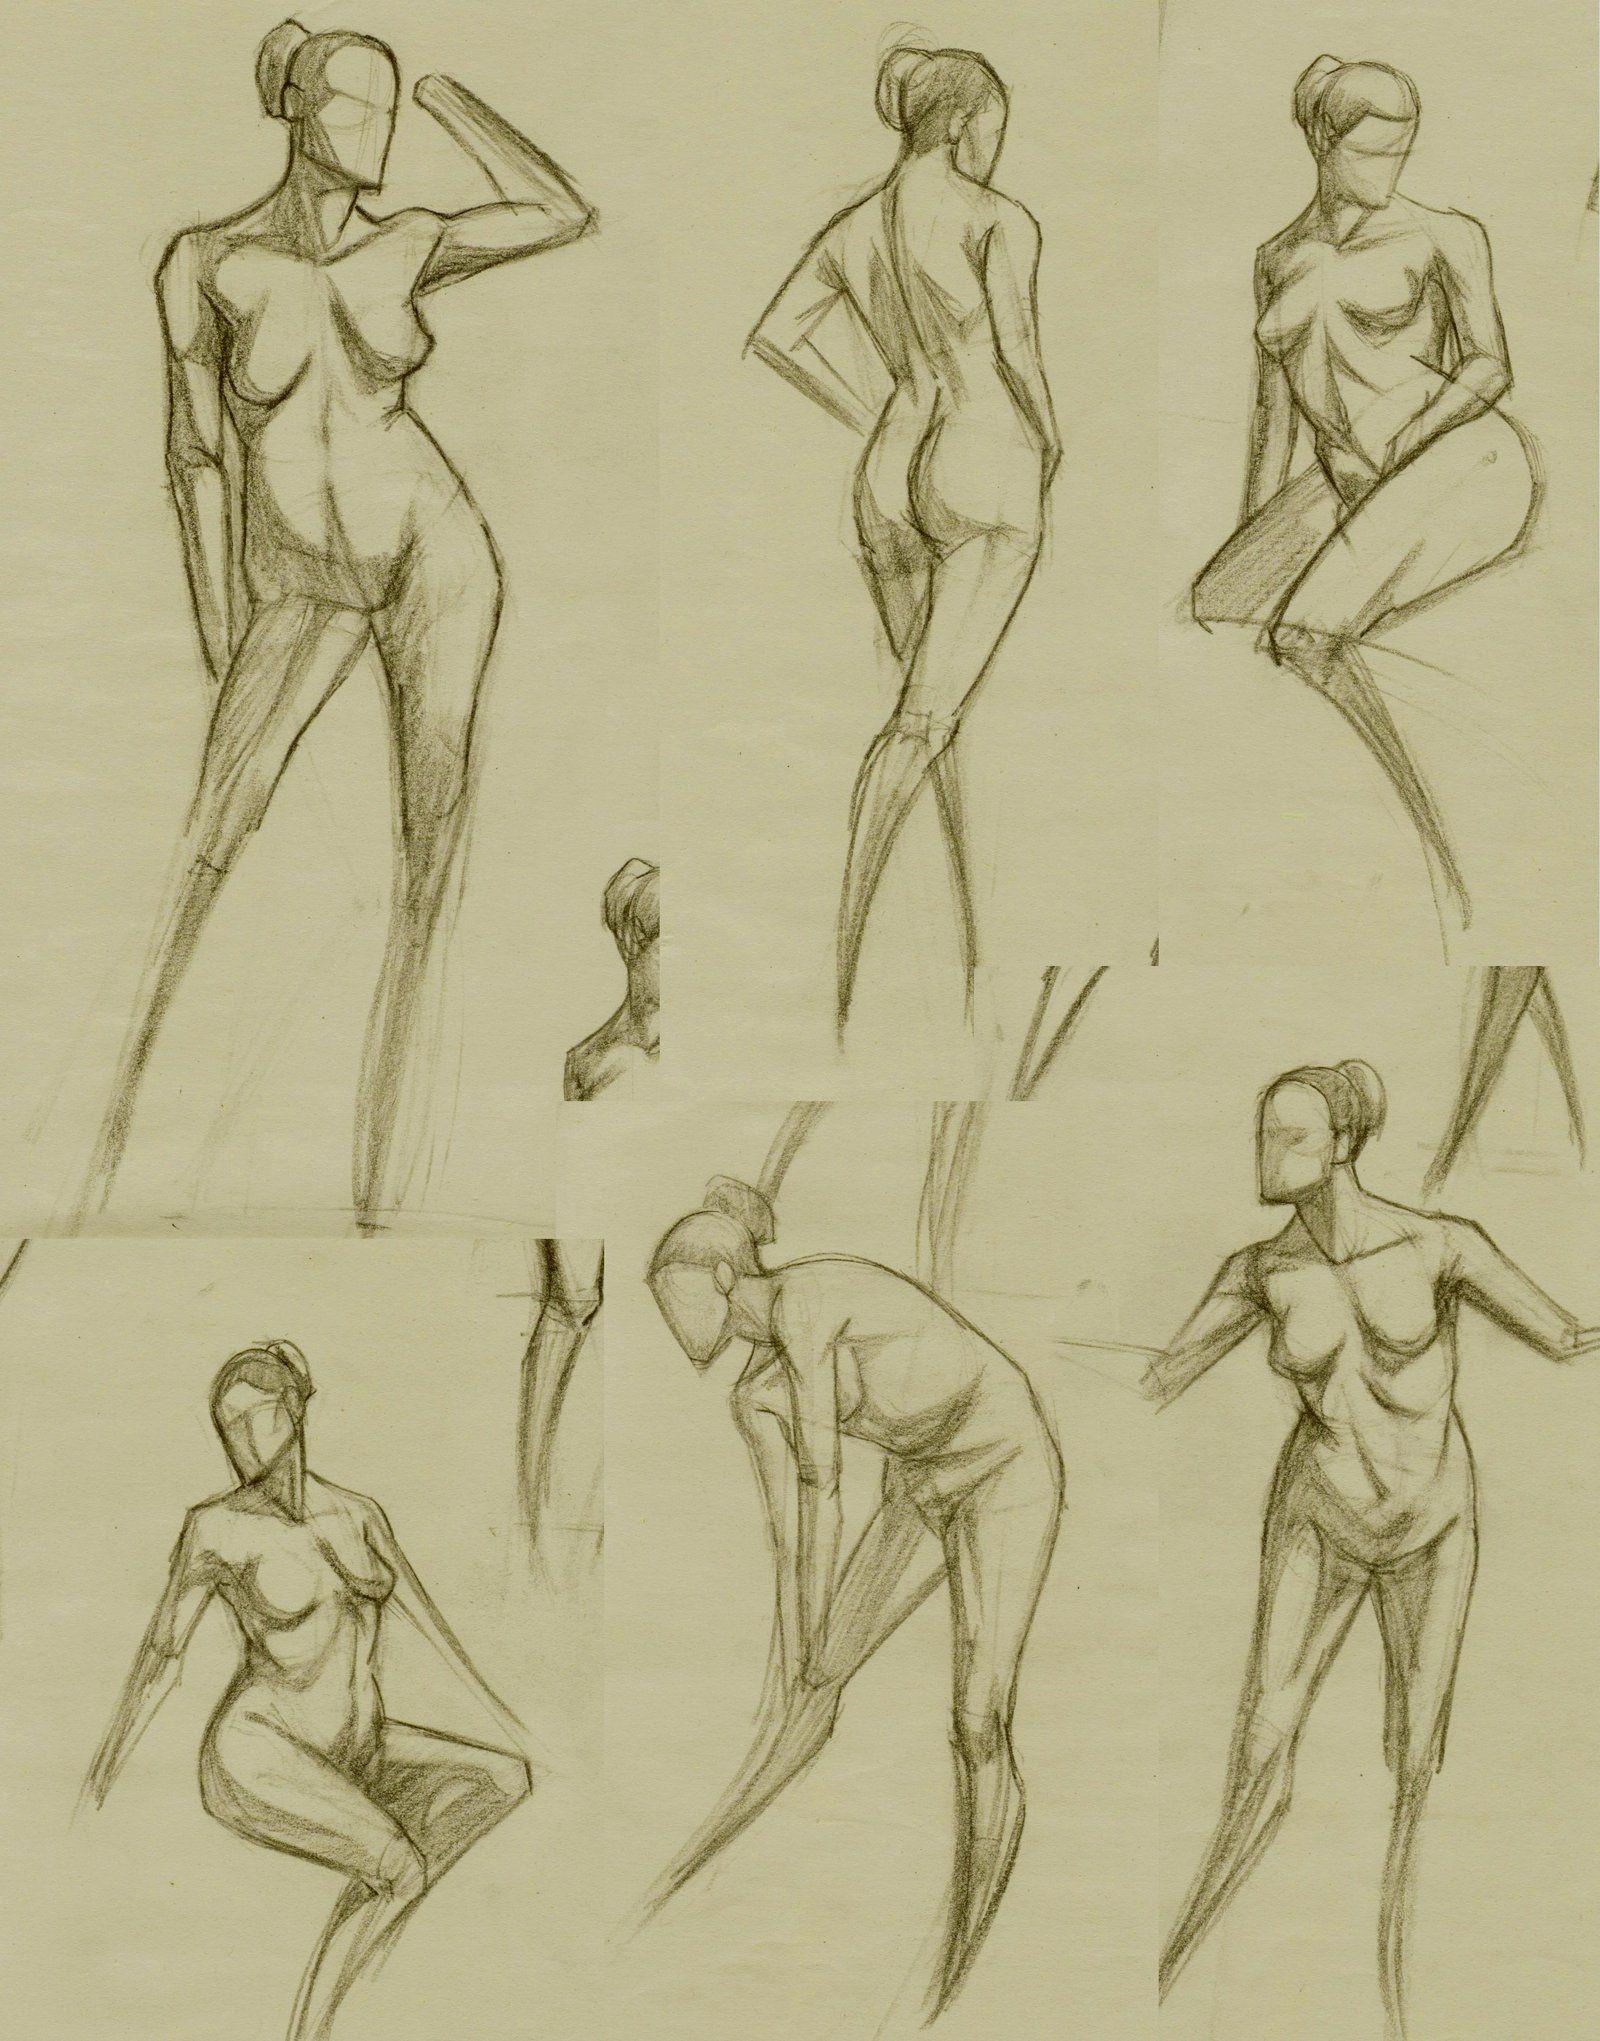 Figure studies. by RoscoeFink on DeviantArt